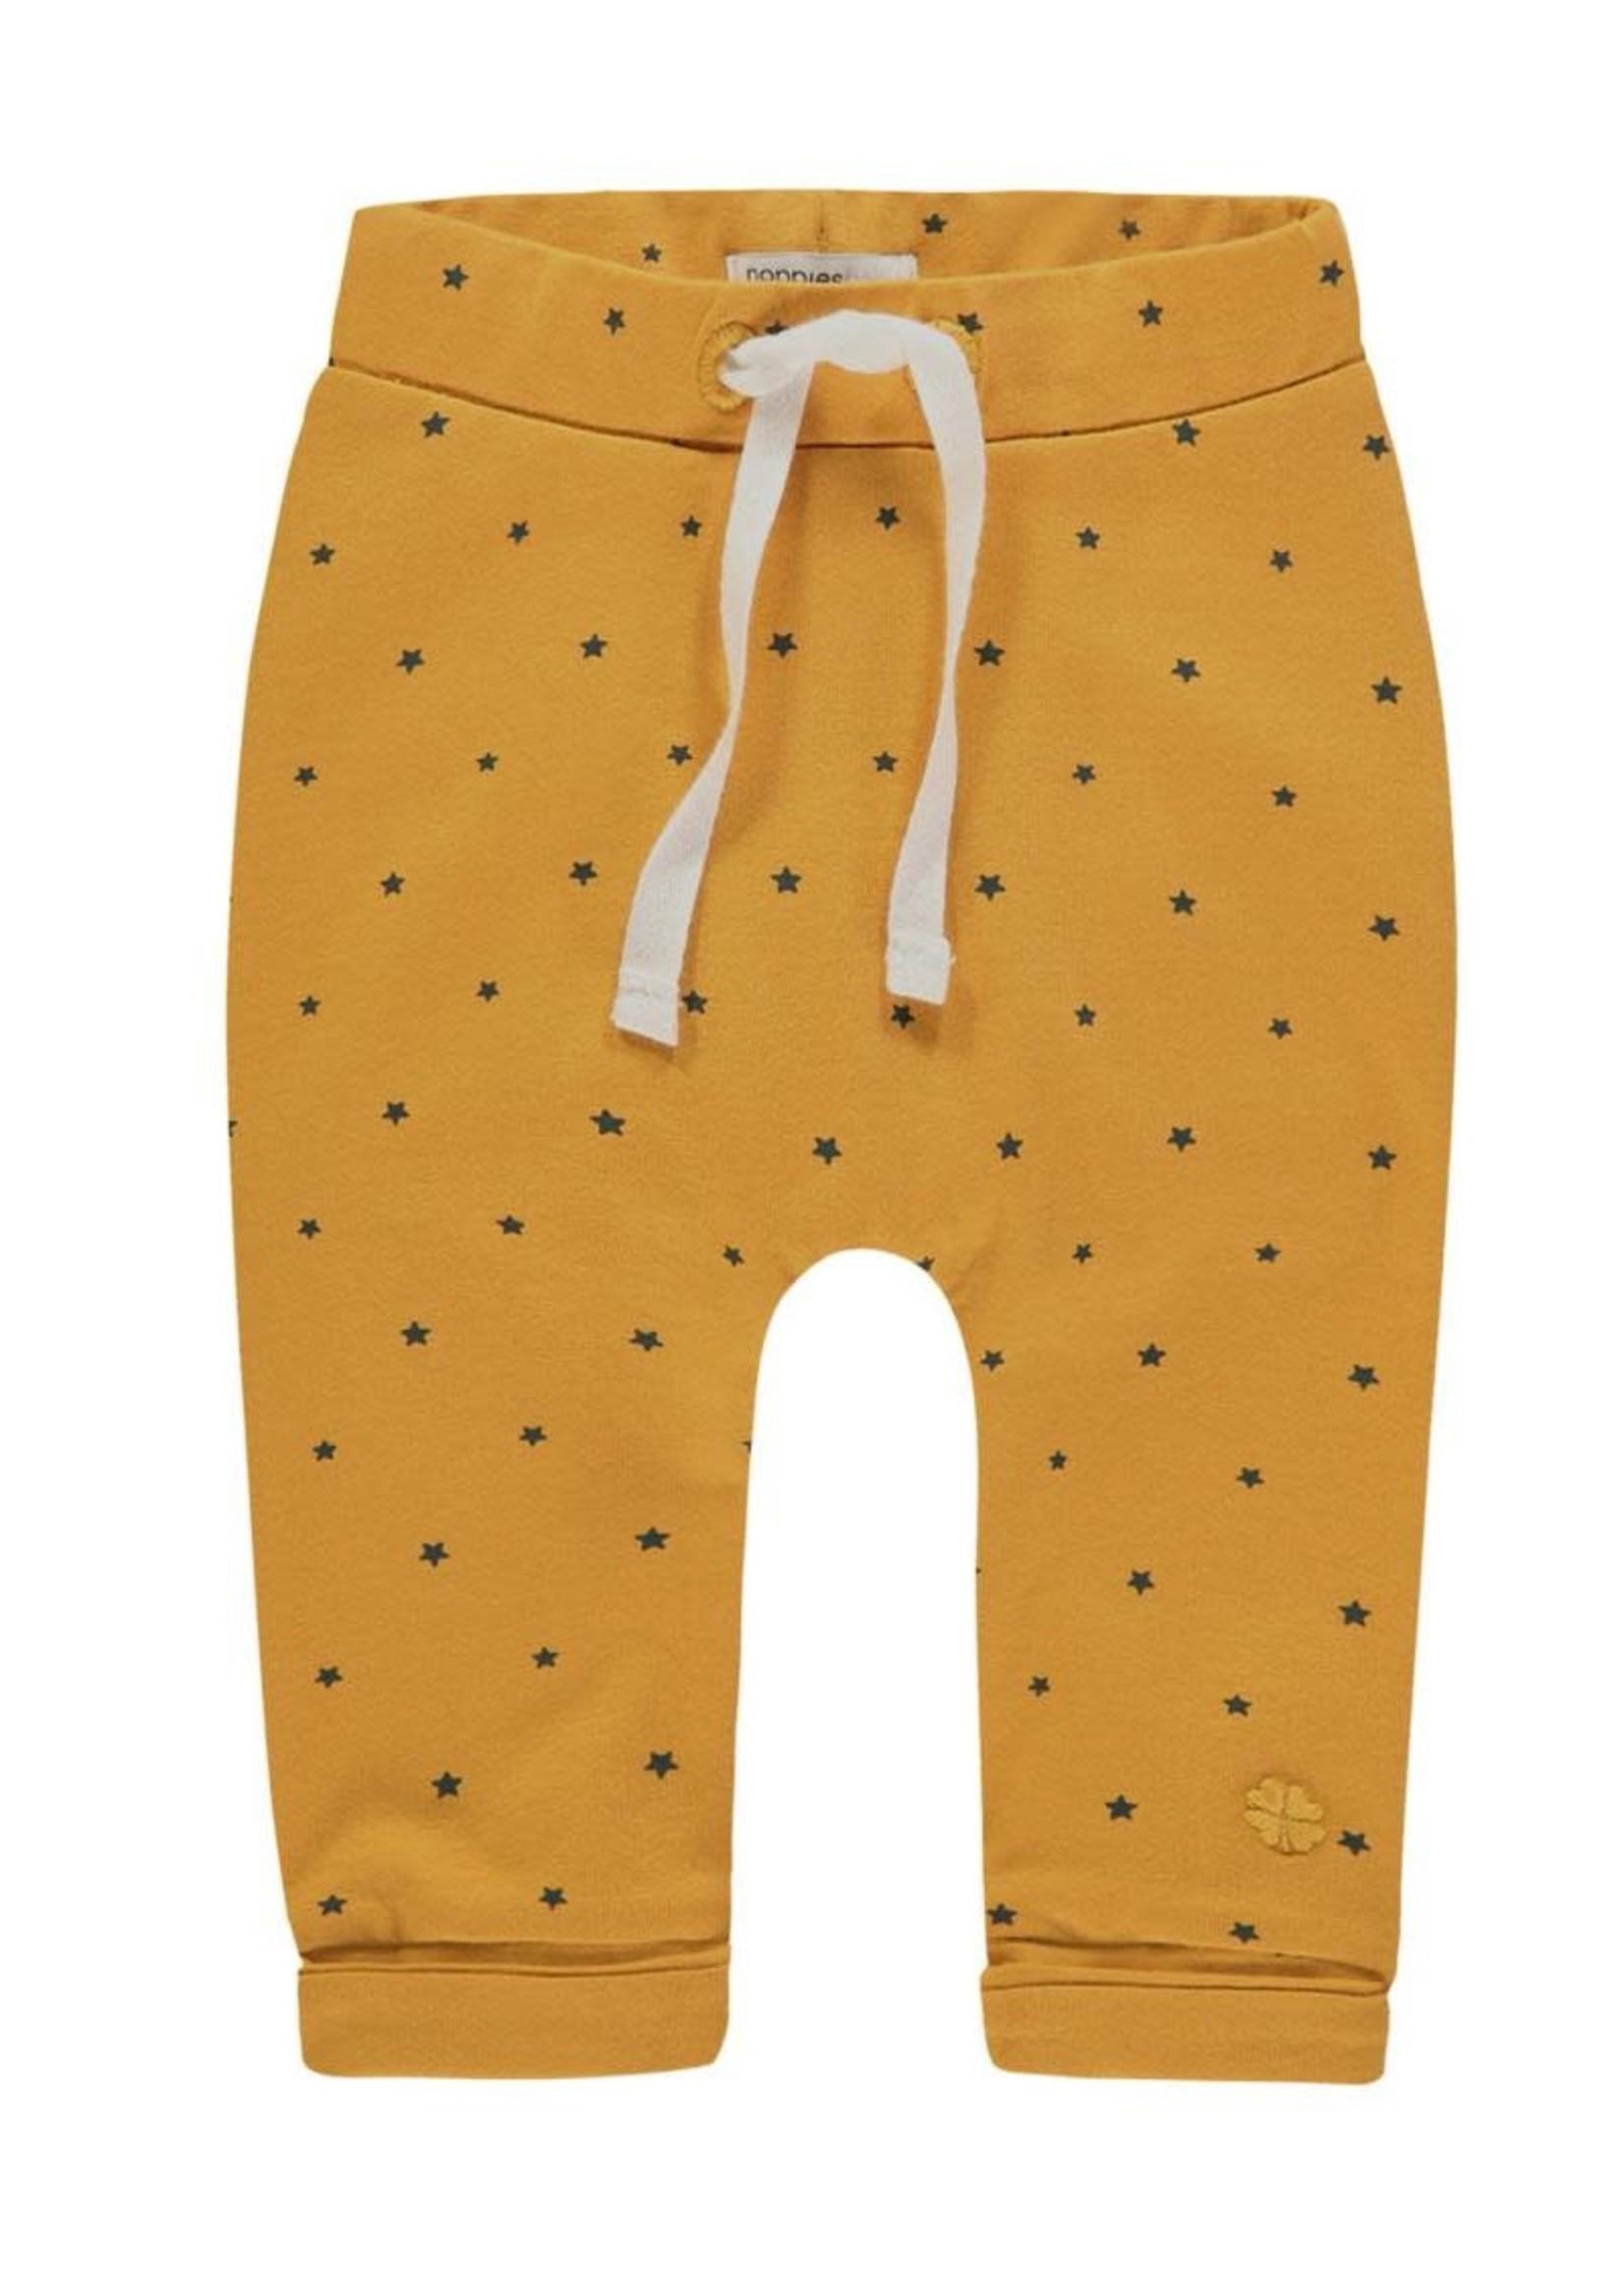 Noppies Kids Noppies Kids, Kris Comfort Pants in Honey Yellow